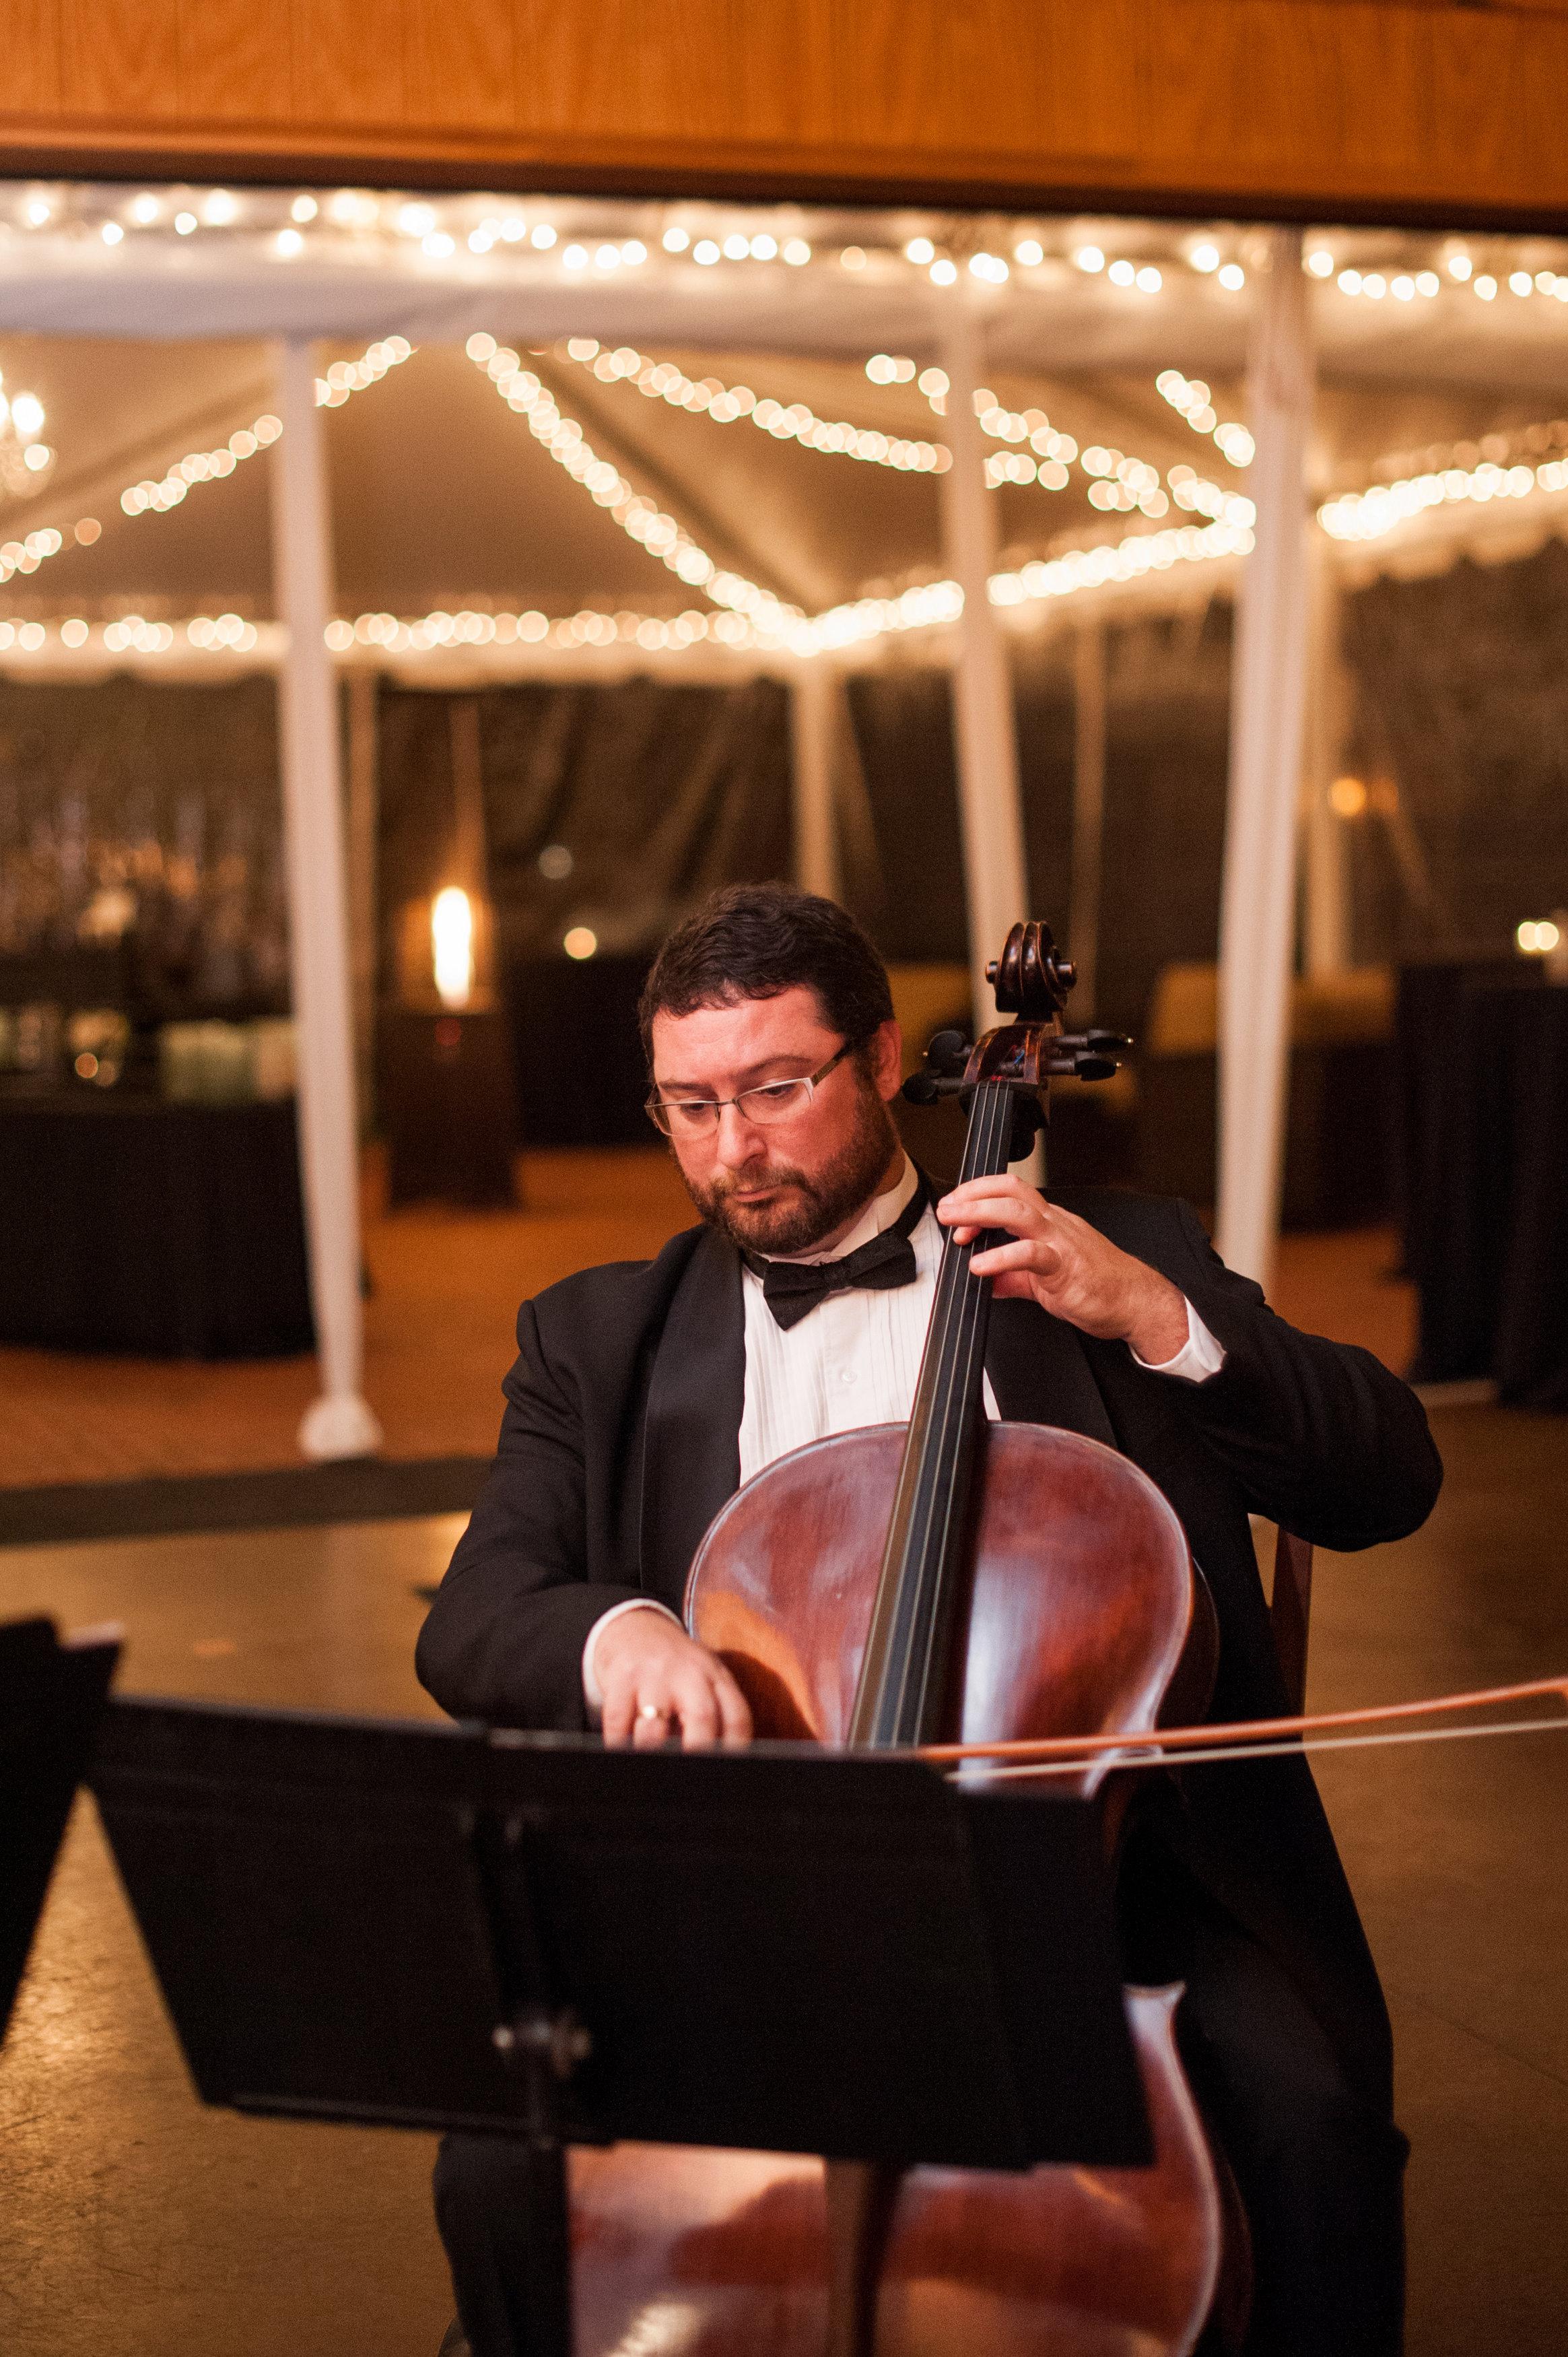 Nate - Cellist